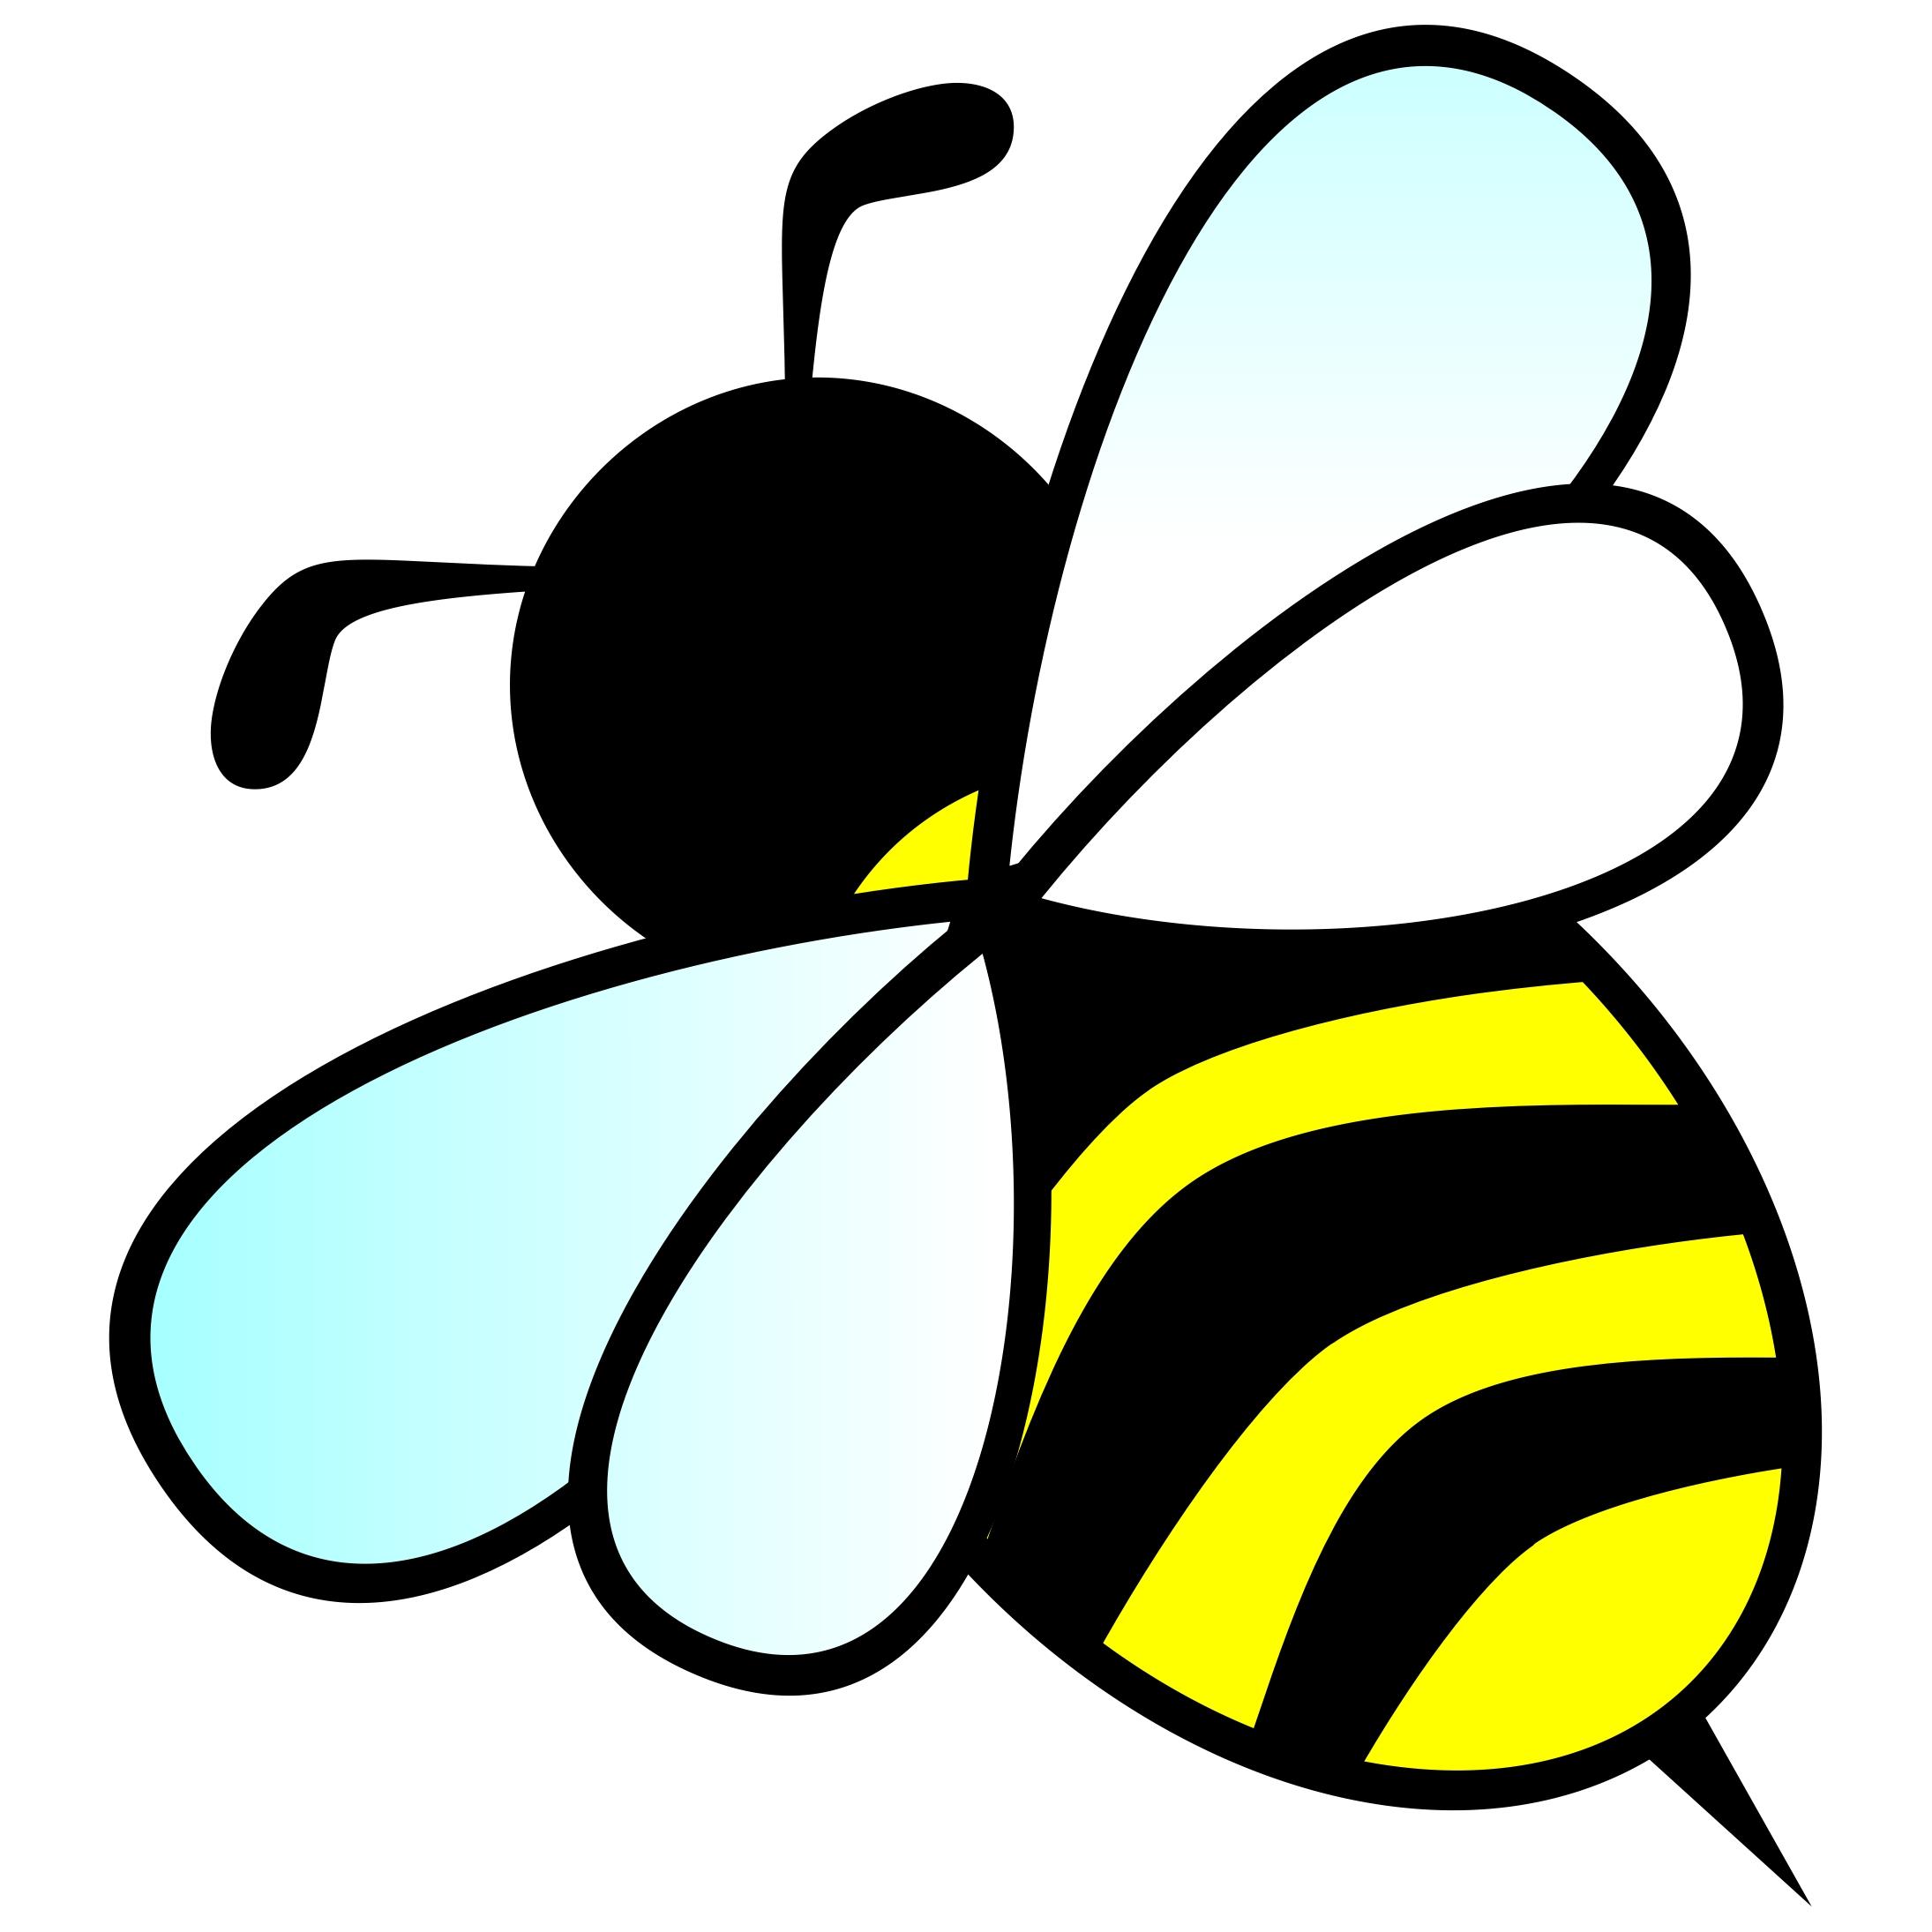 Bumblebee clipart buzzy bee. Best of bees gallery